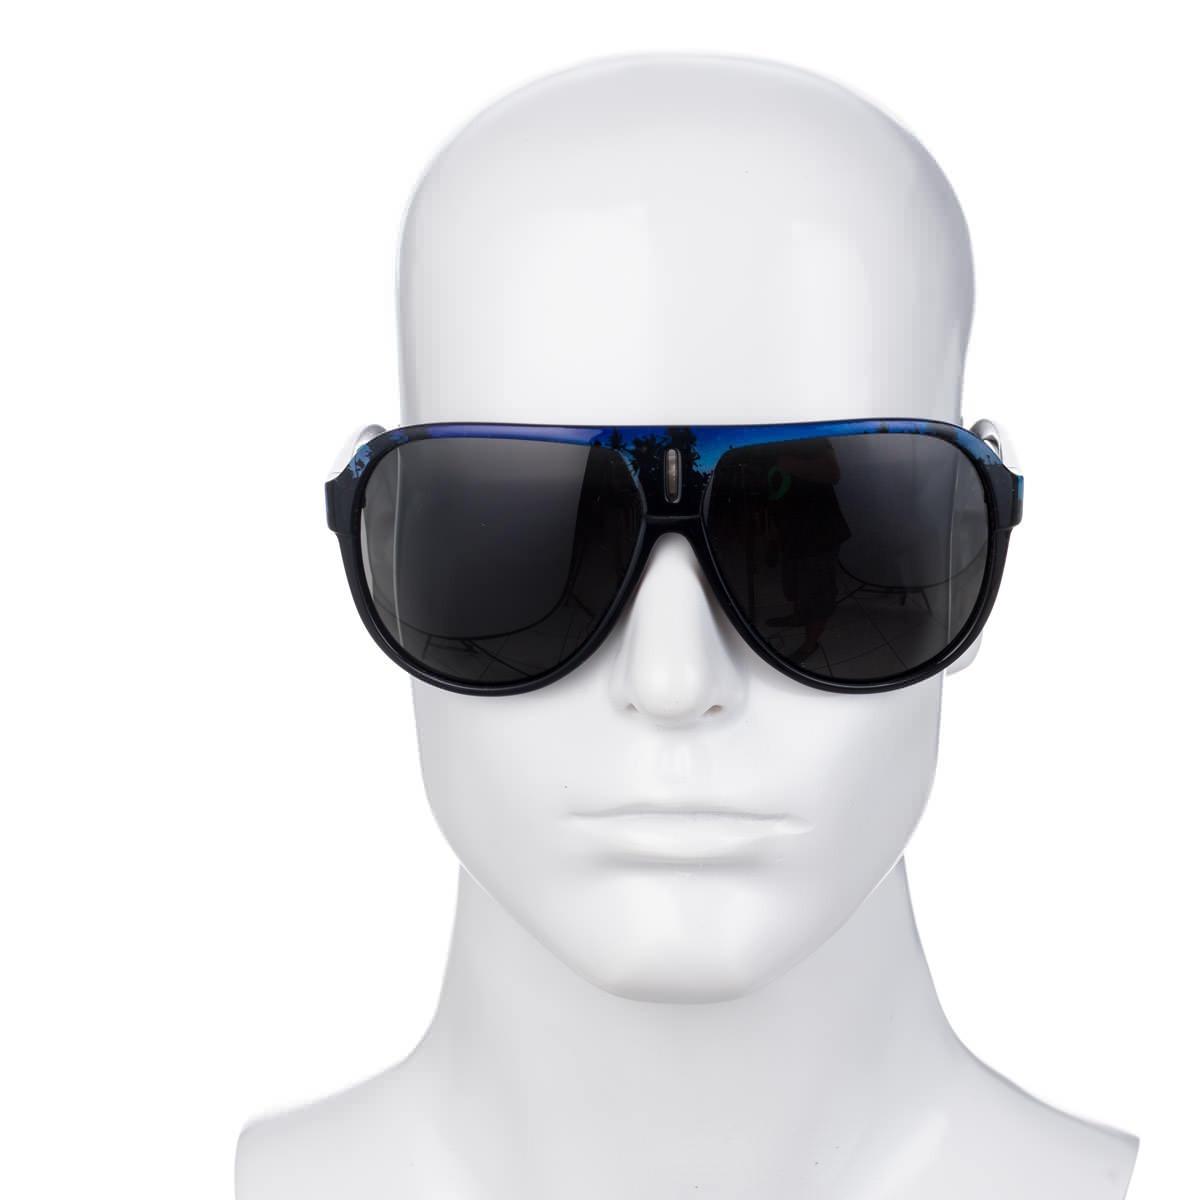 19c59d06e3506 óculos dragon experience bali focus - original. Carregando zoom.